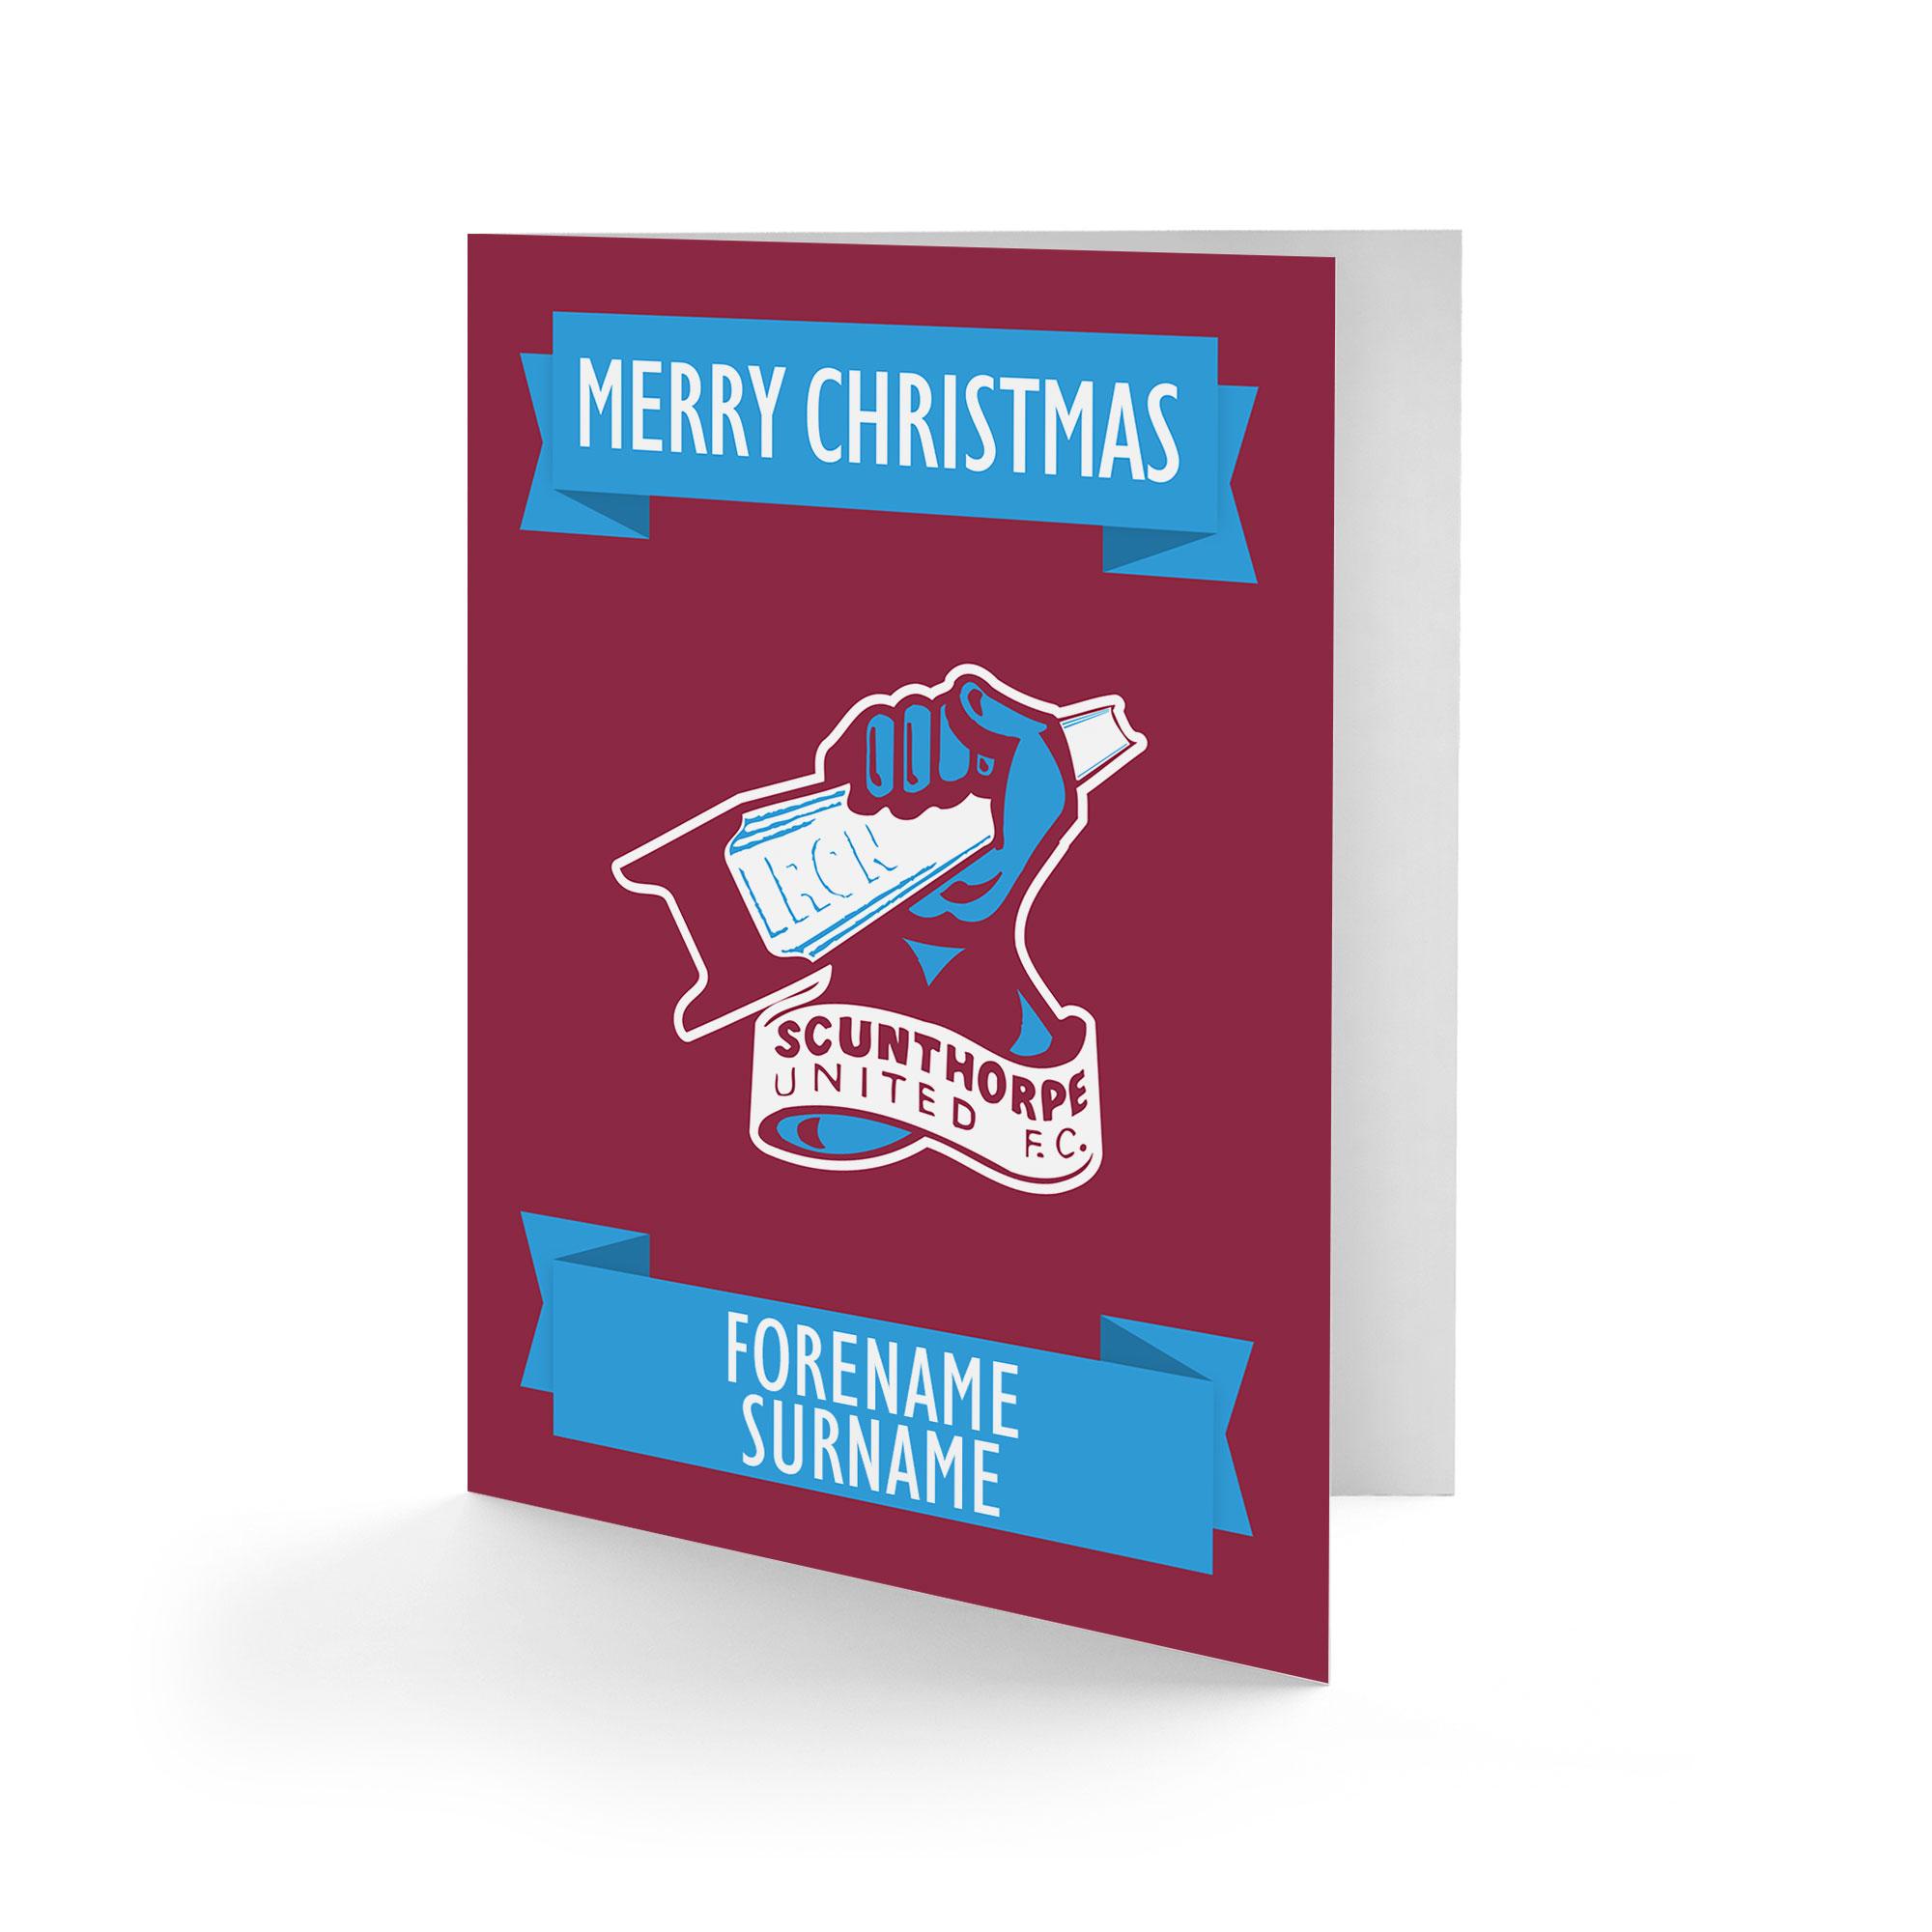 Scunthorpe United FC Crest Christmas Card